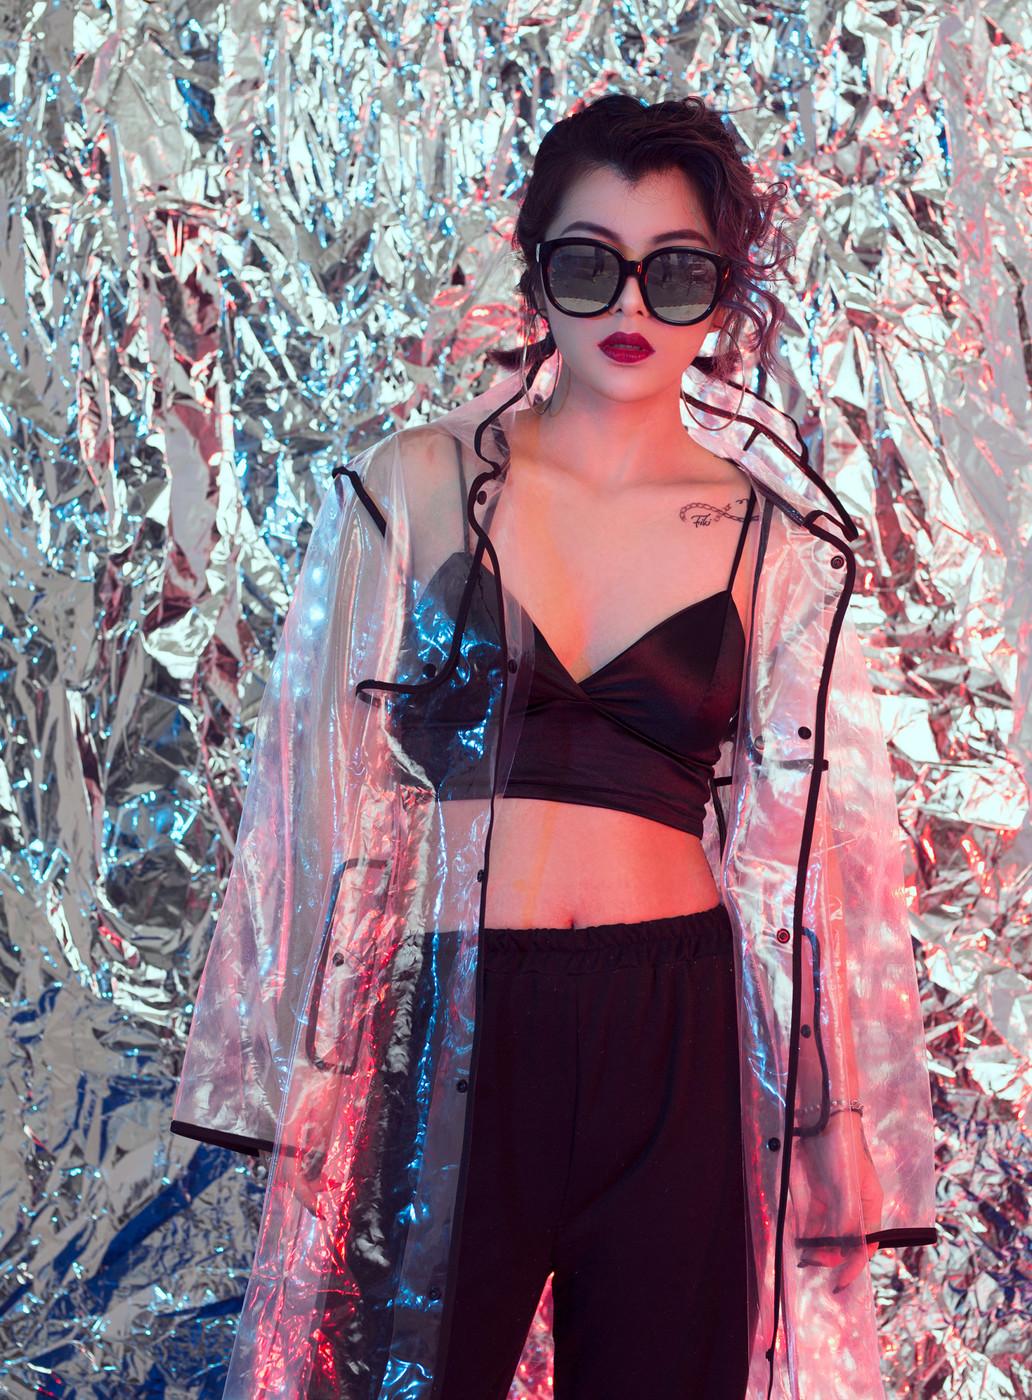 Cool girl【形象拍摄】18